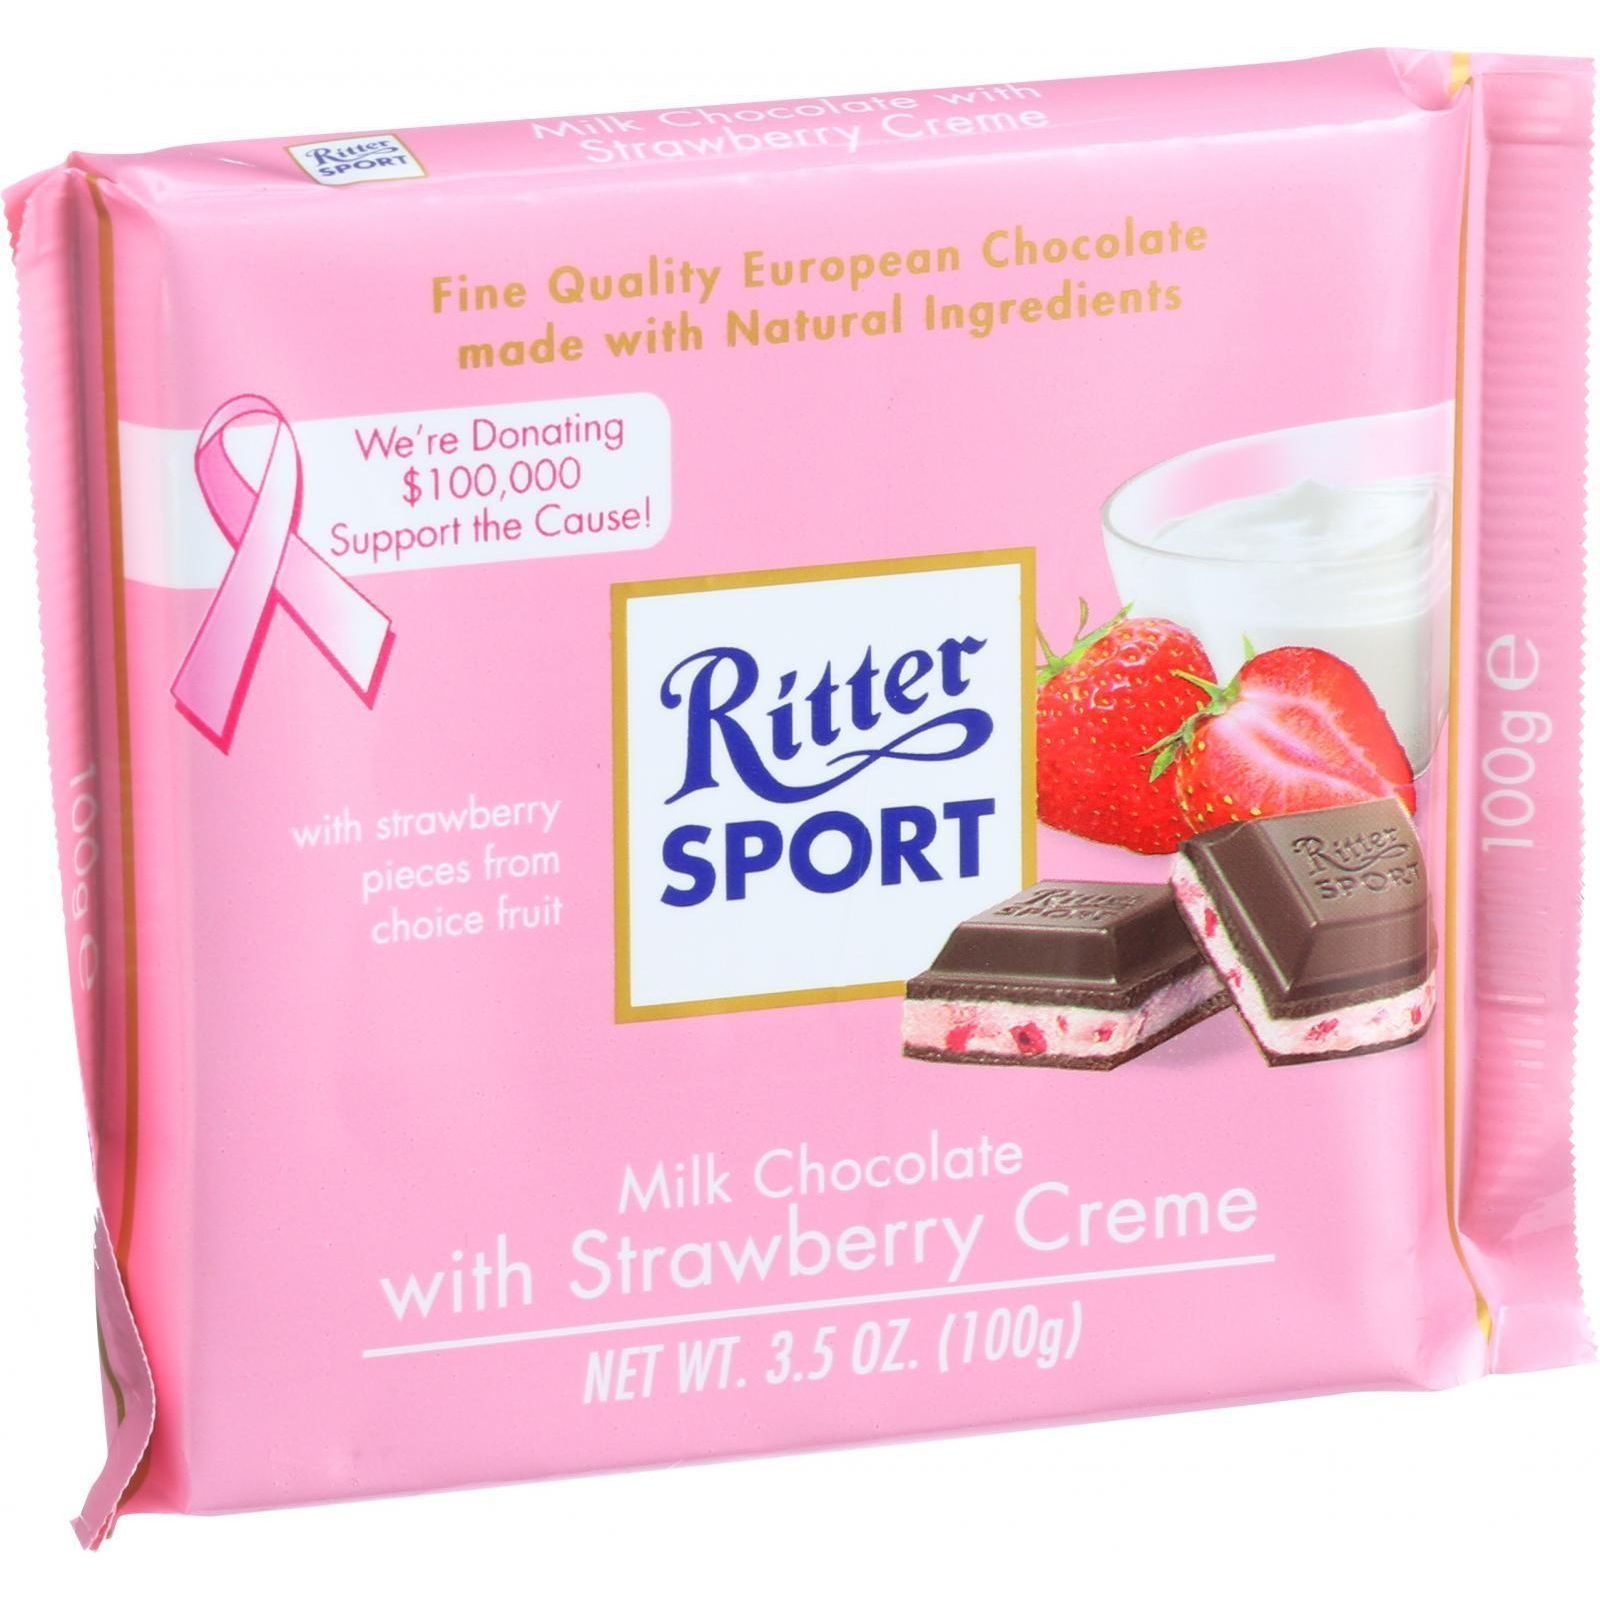 Ritter Sport Chocolate Bar Milk Chocolate Strawberry